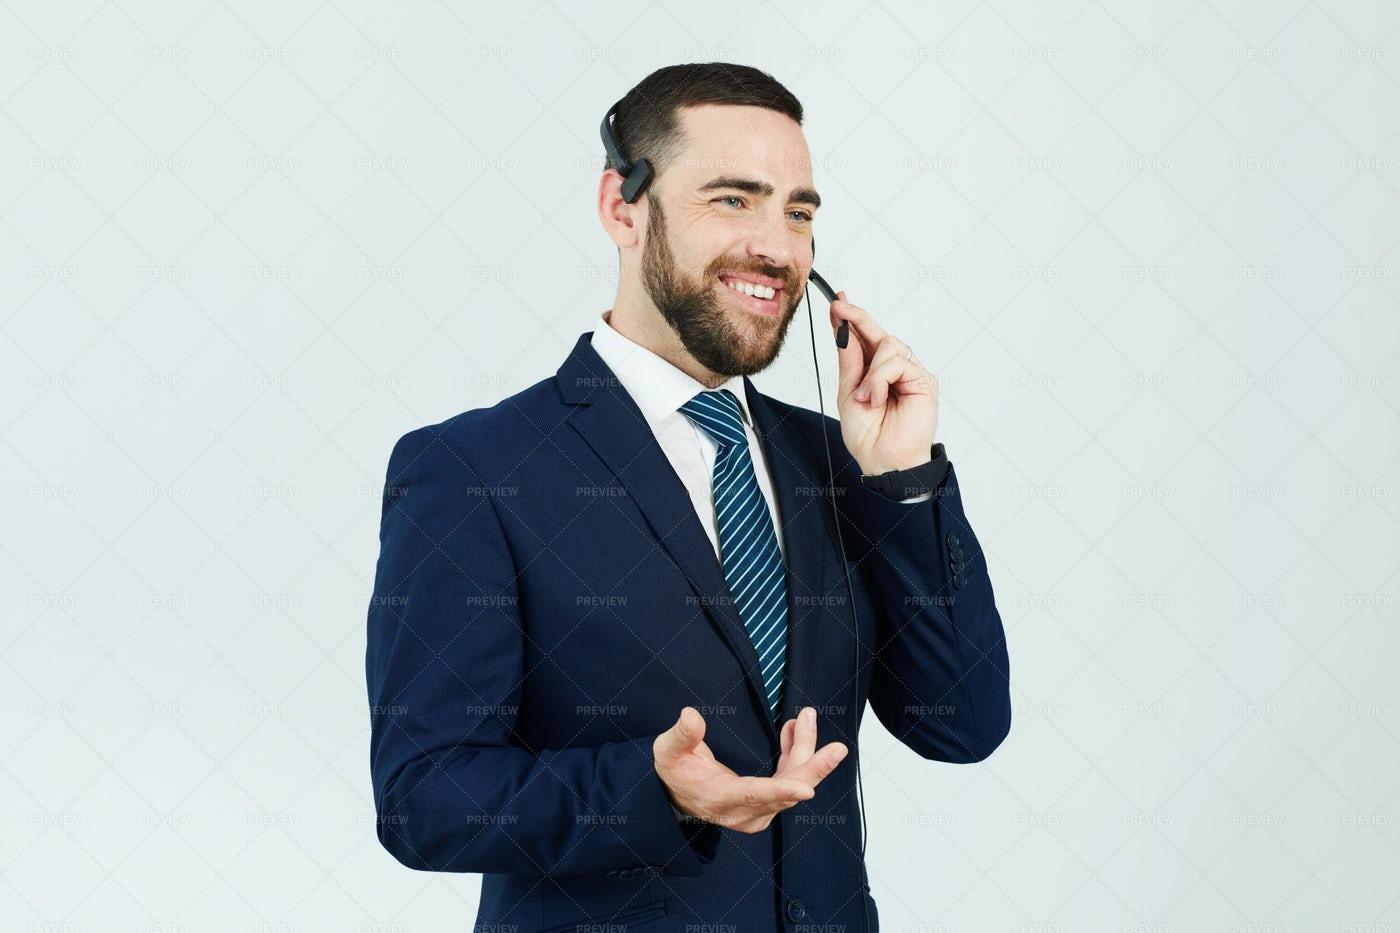 Call Center Operator Answering Phone: Stock Photos